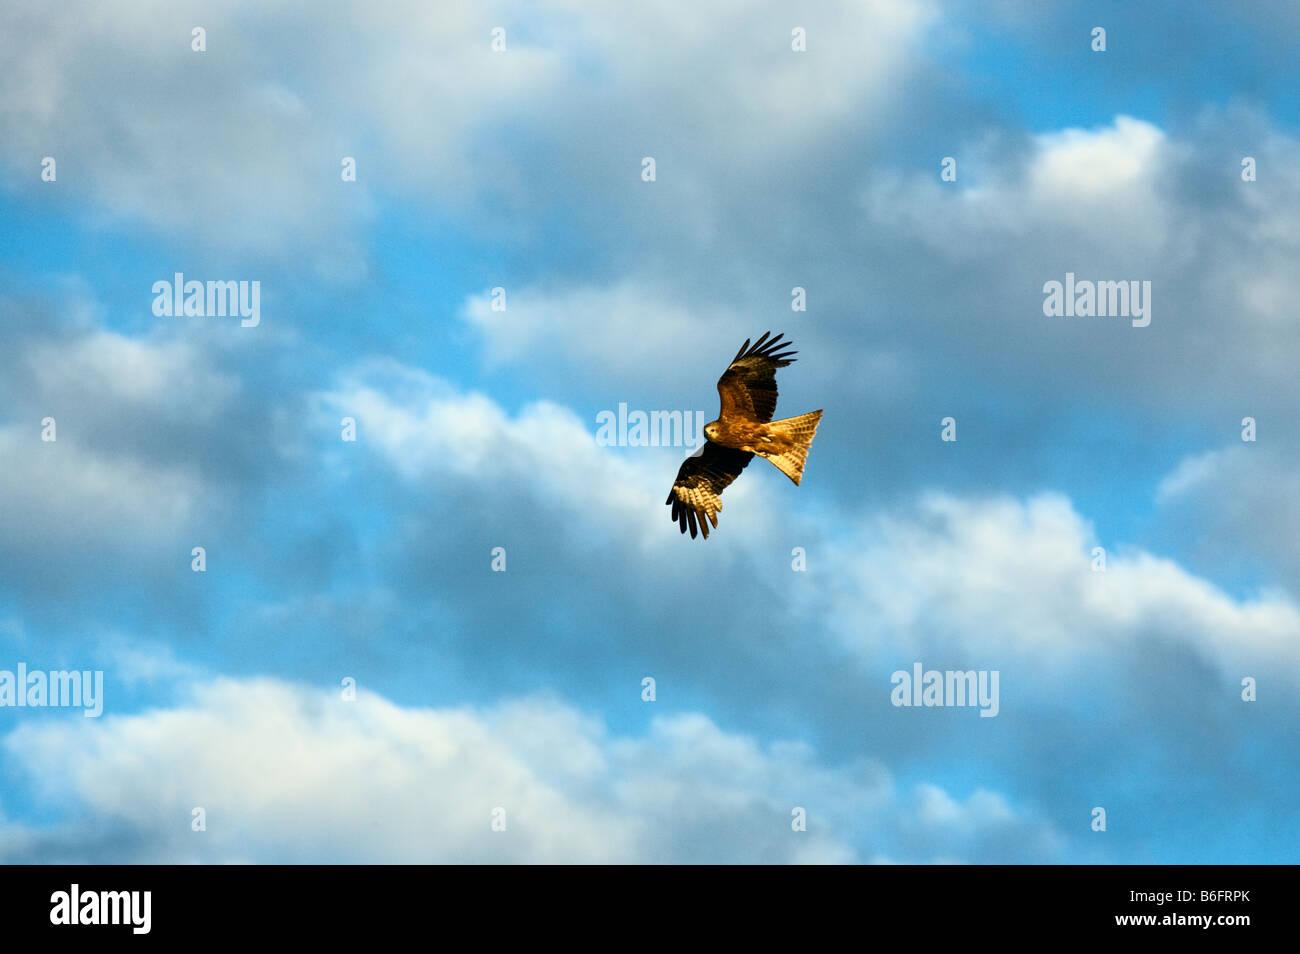 Hover falcon Altay Russian federatoin - Stock Image